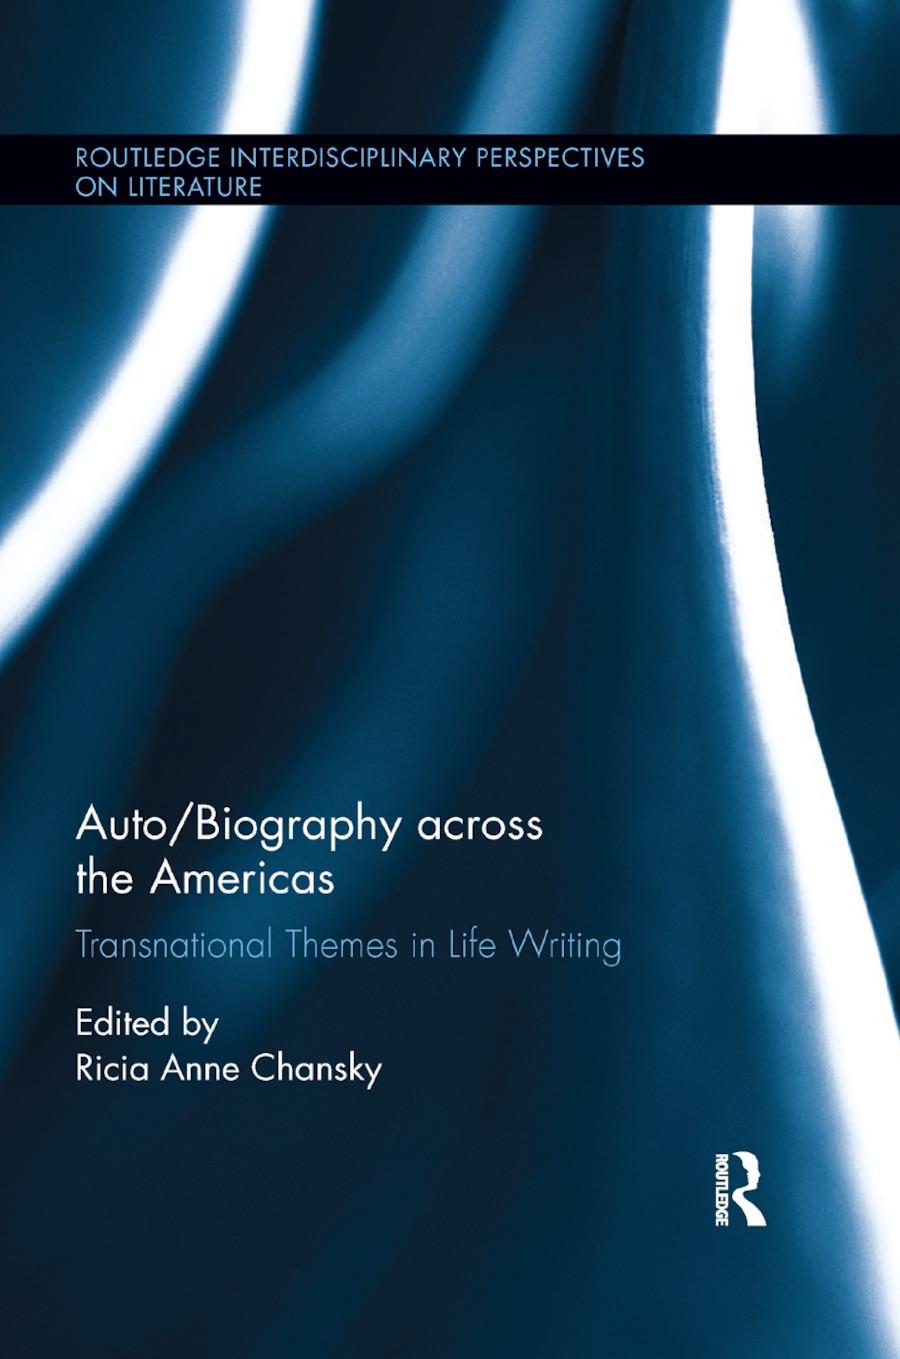 Auto/Biography across the Americas